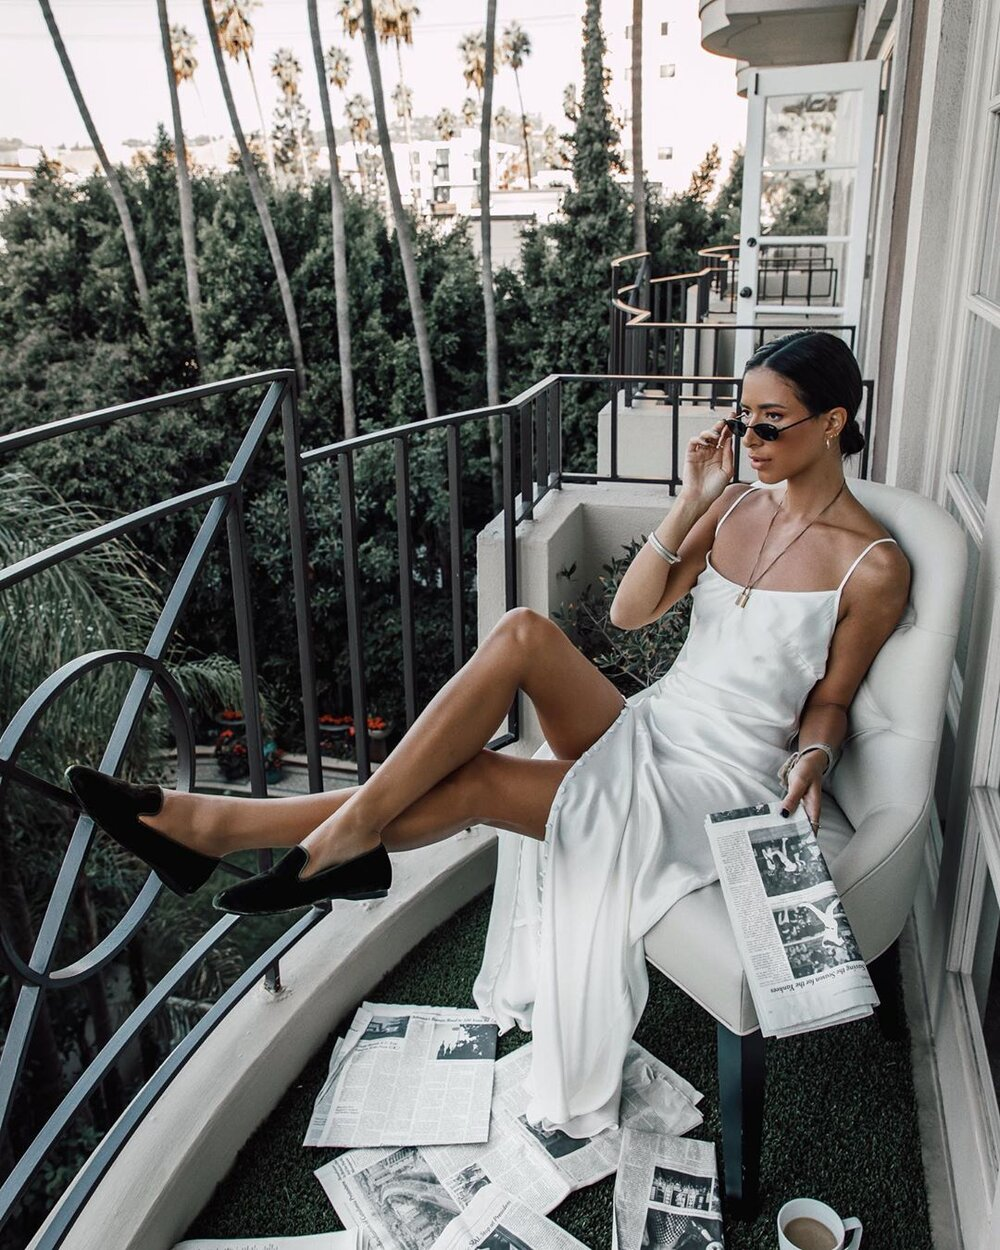 Lady sitting on a balcony